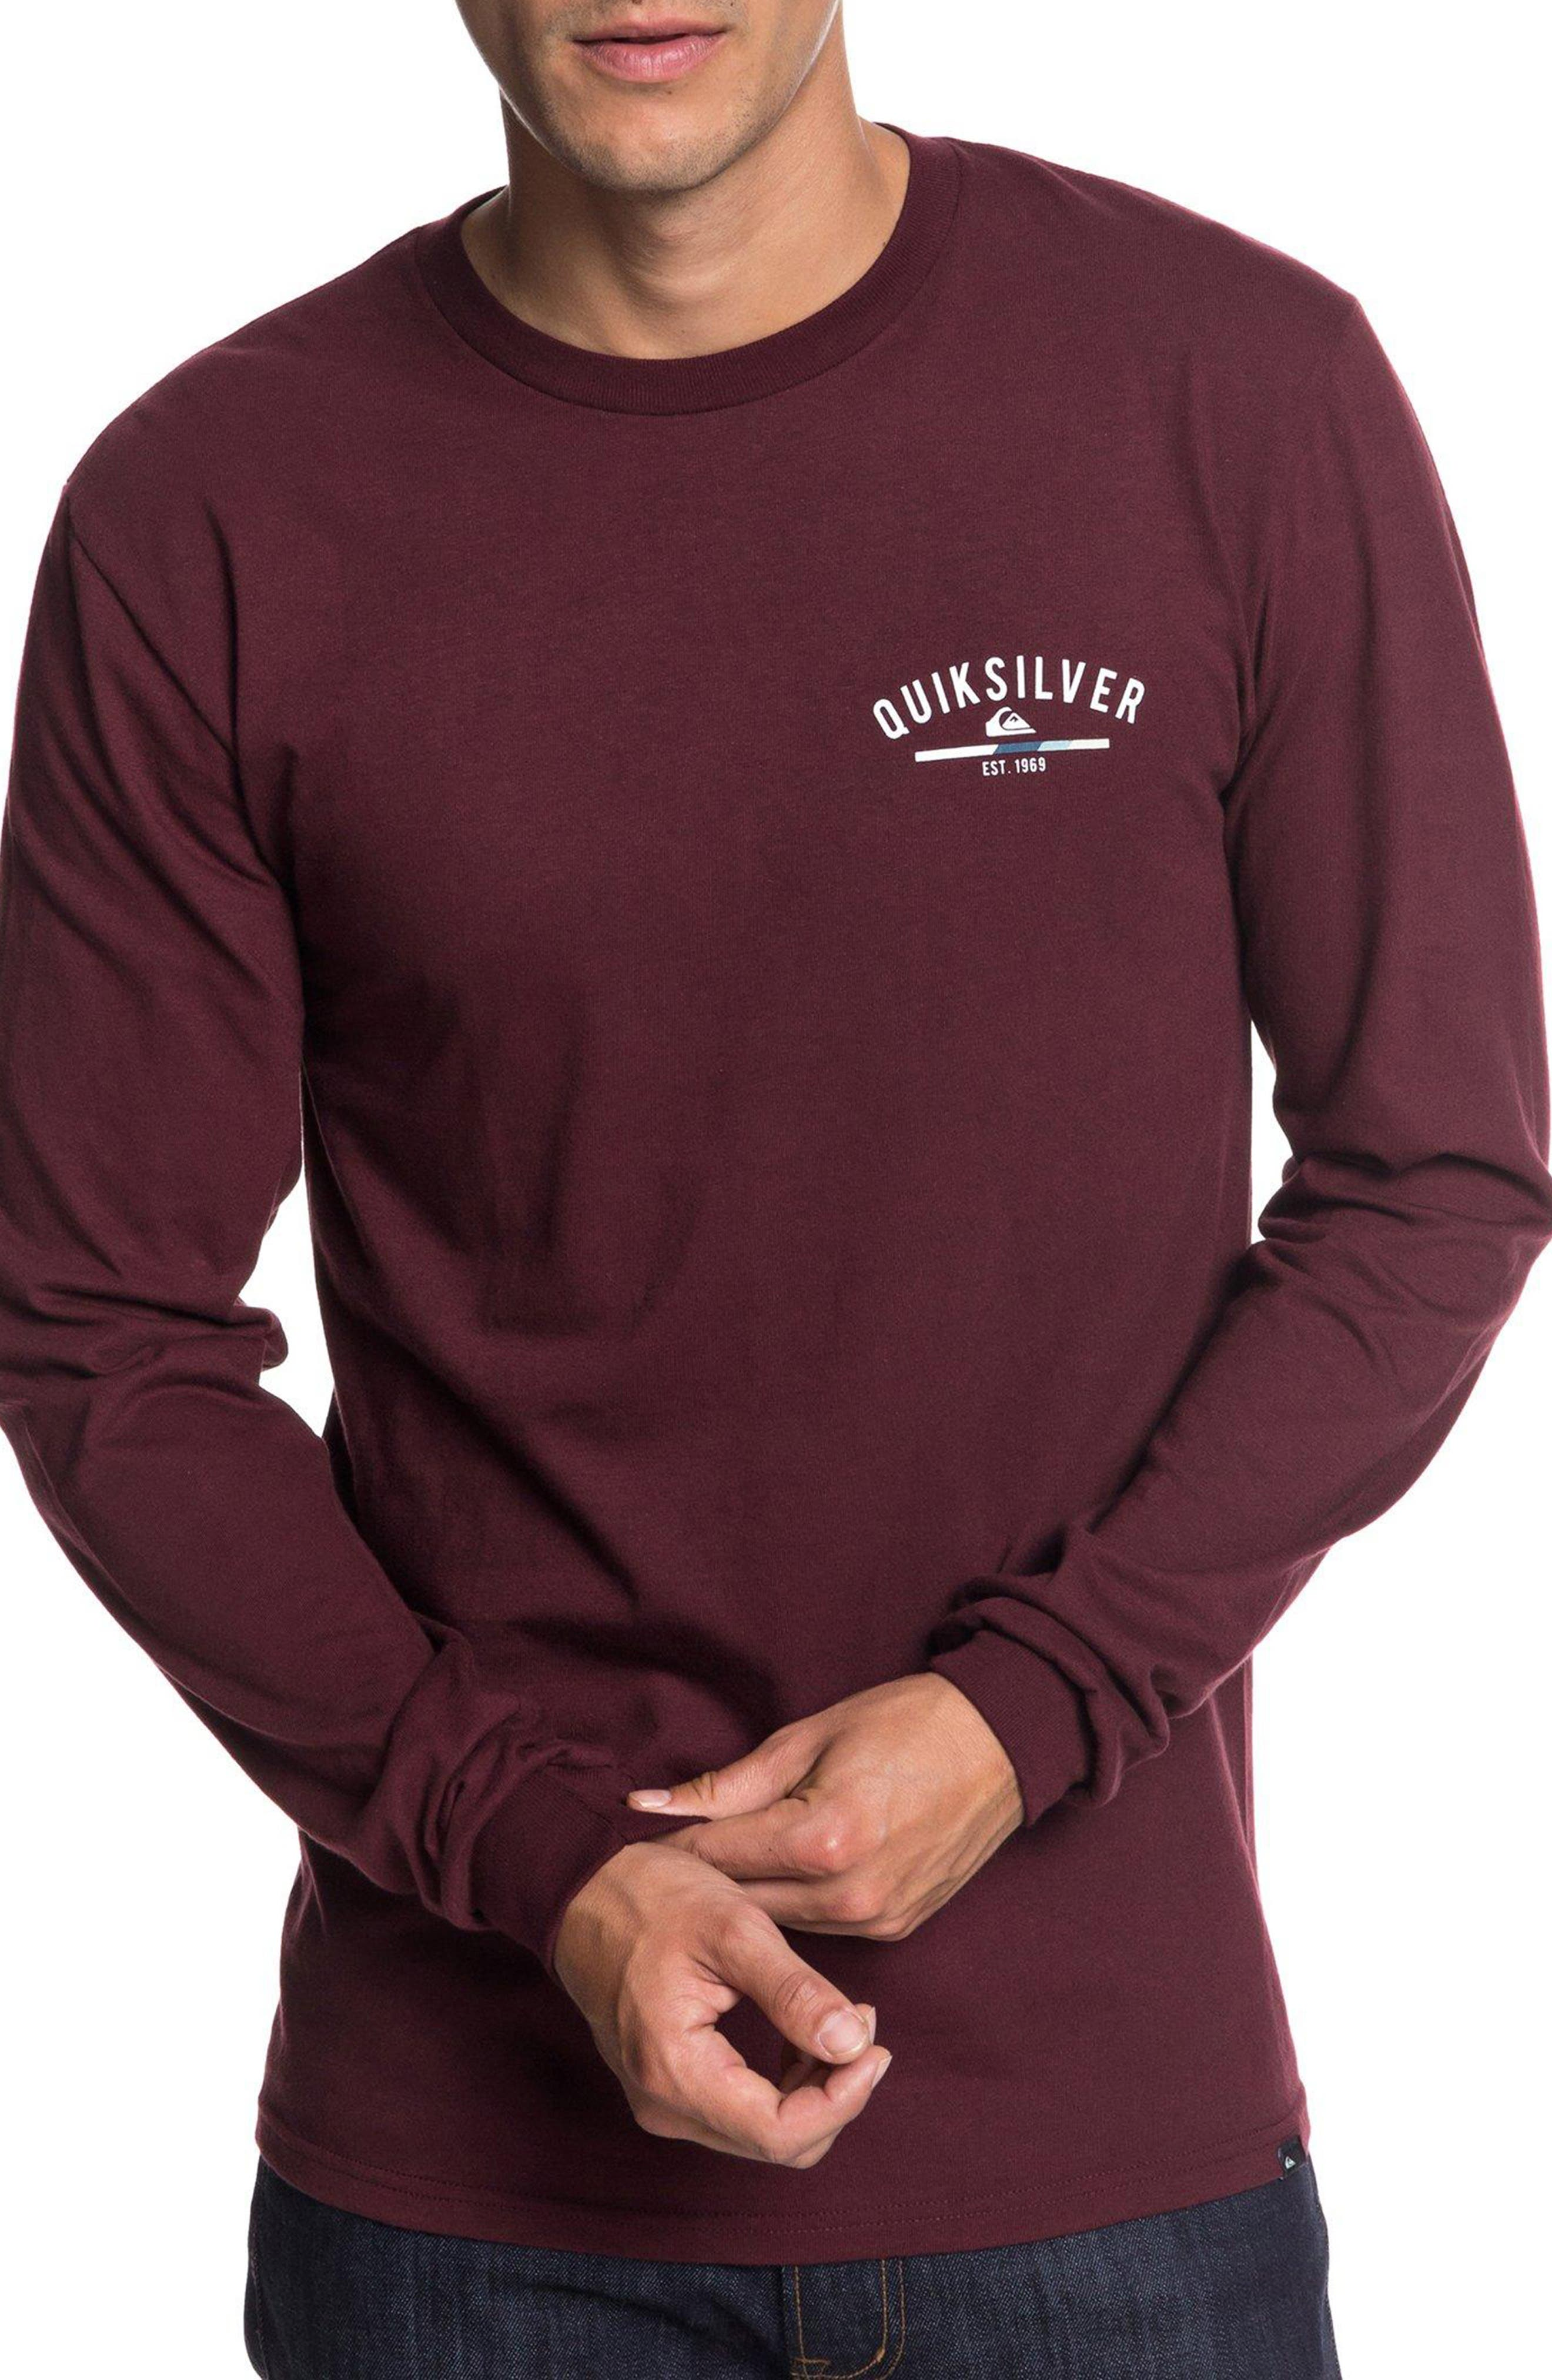 QUIKSILVER Simple Colour Long Sleeve T-Shirt in Port Royale